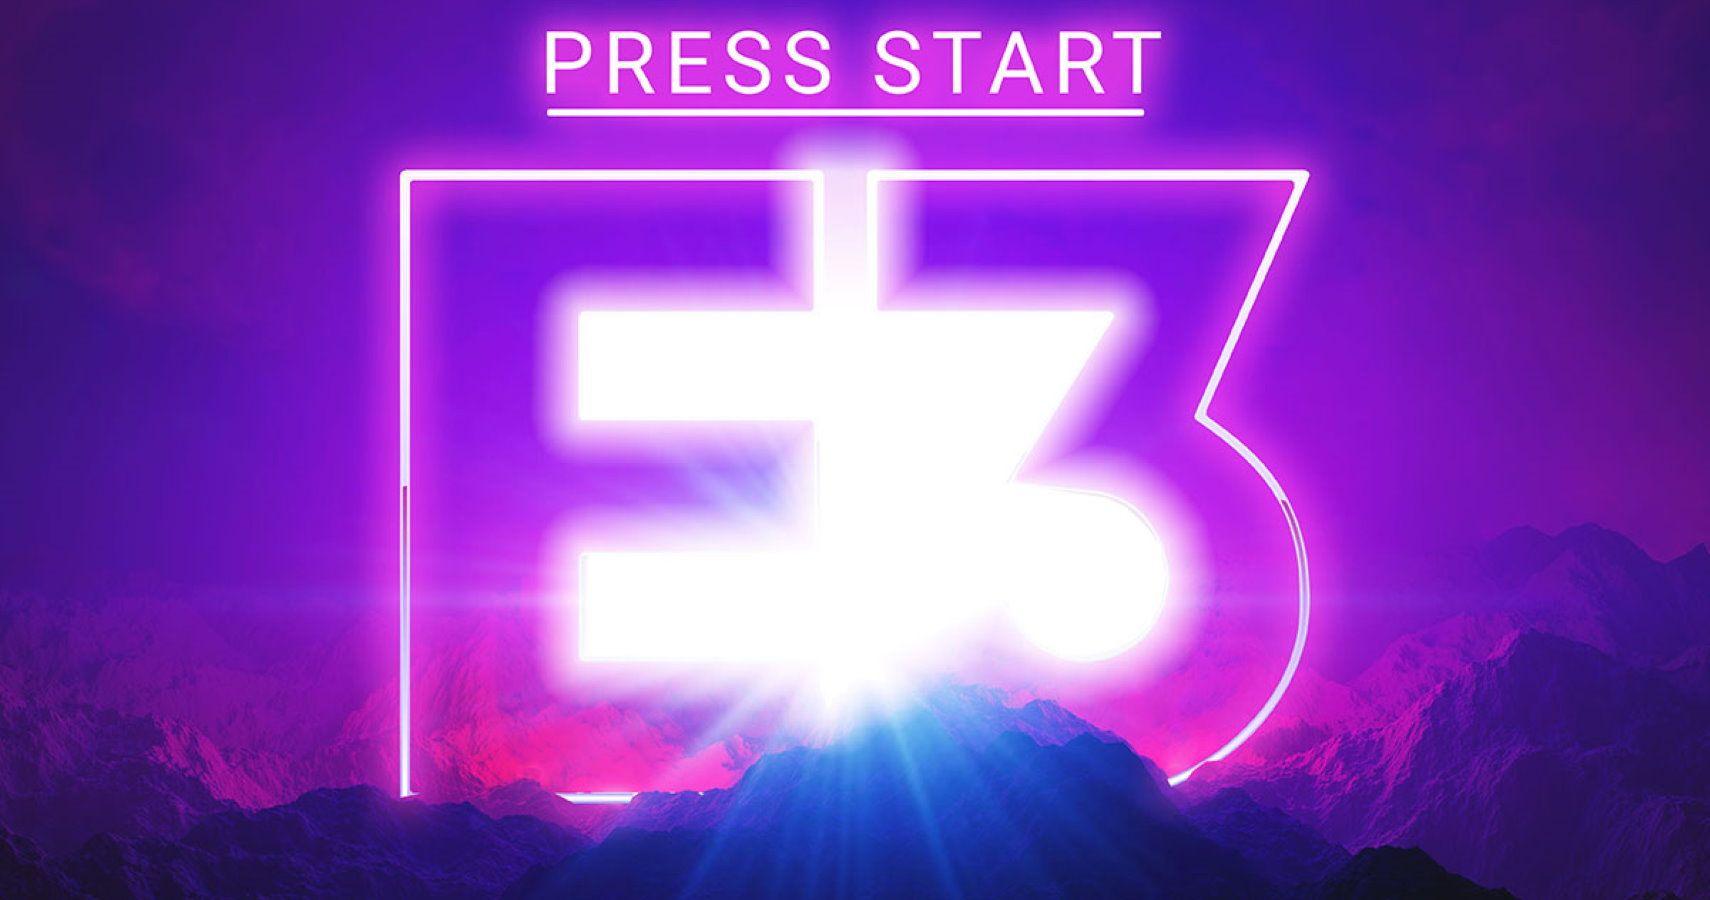 E3 2021, día 3, transmisión completa del evento: míralo en vivo aquí